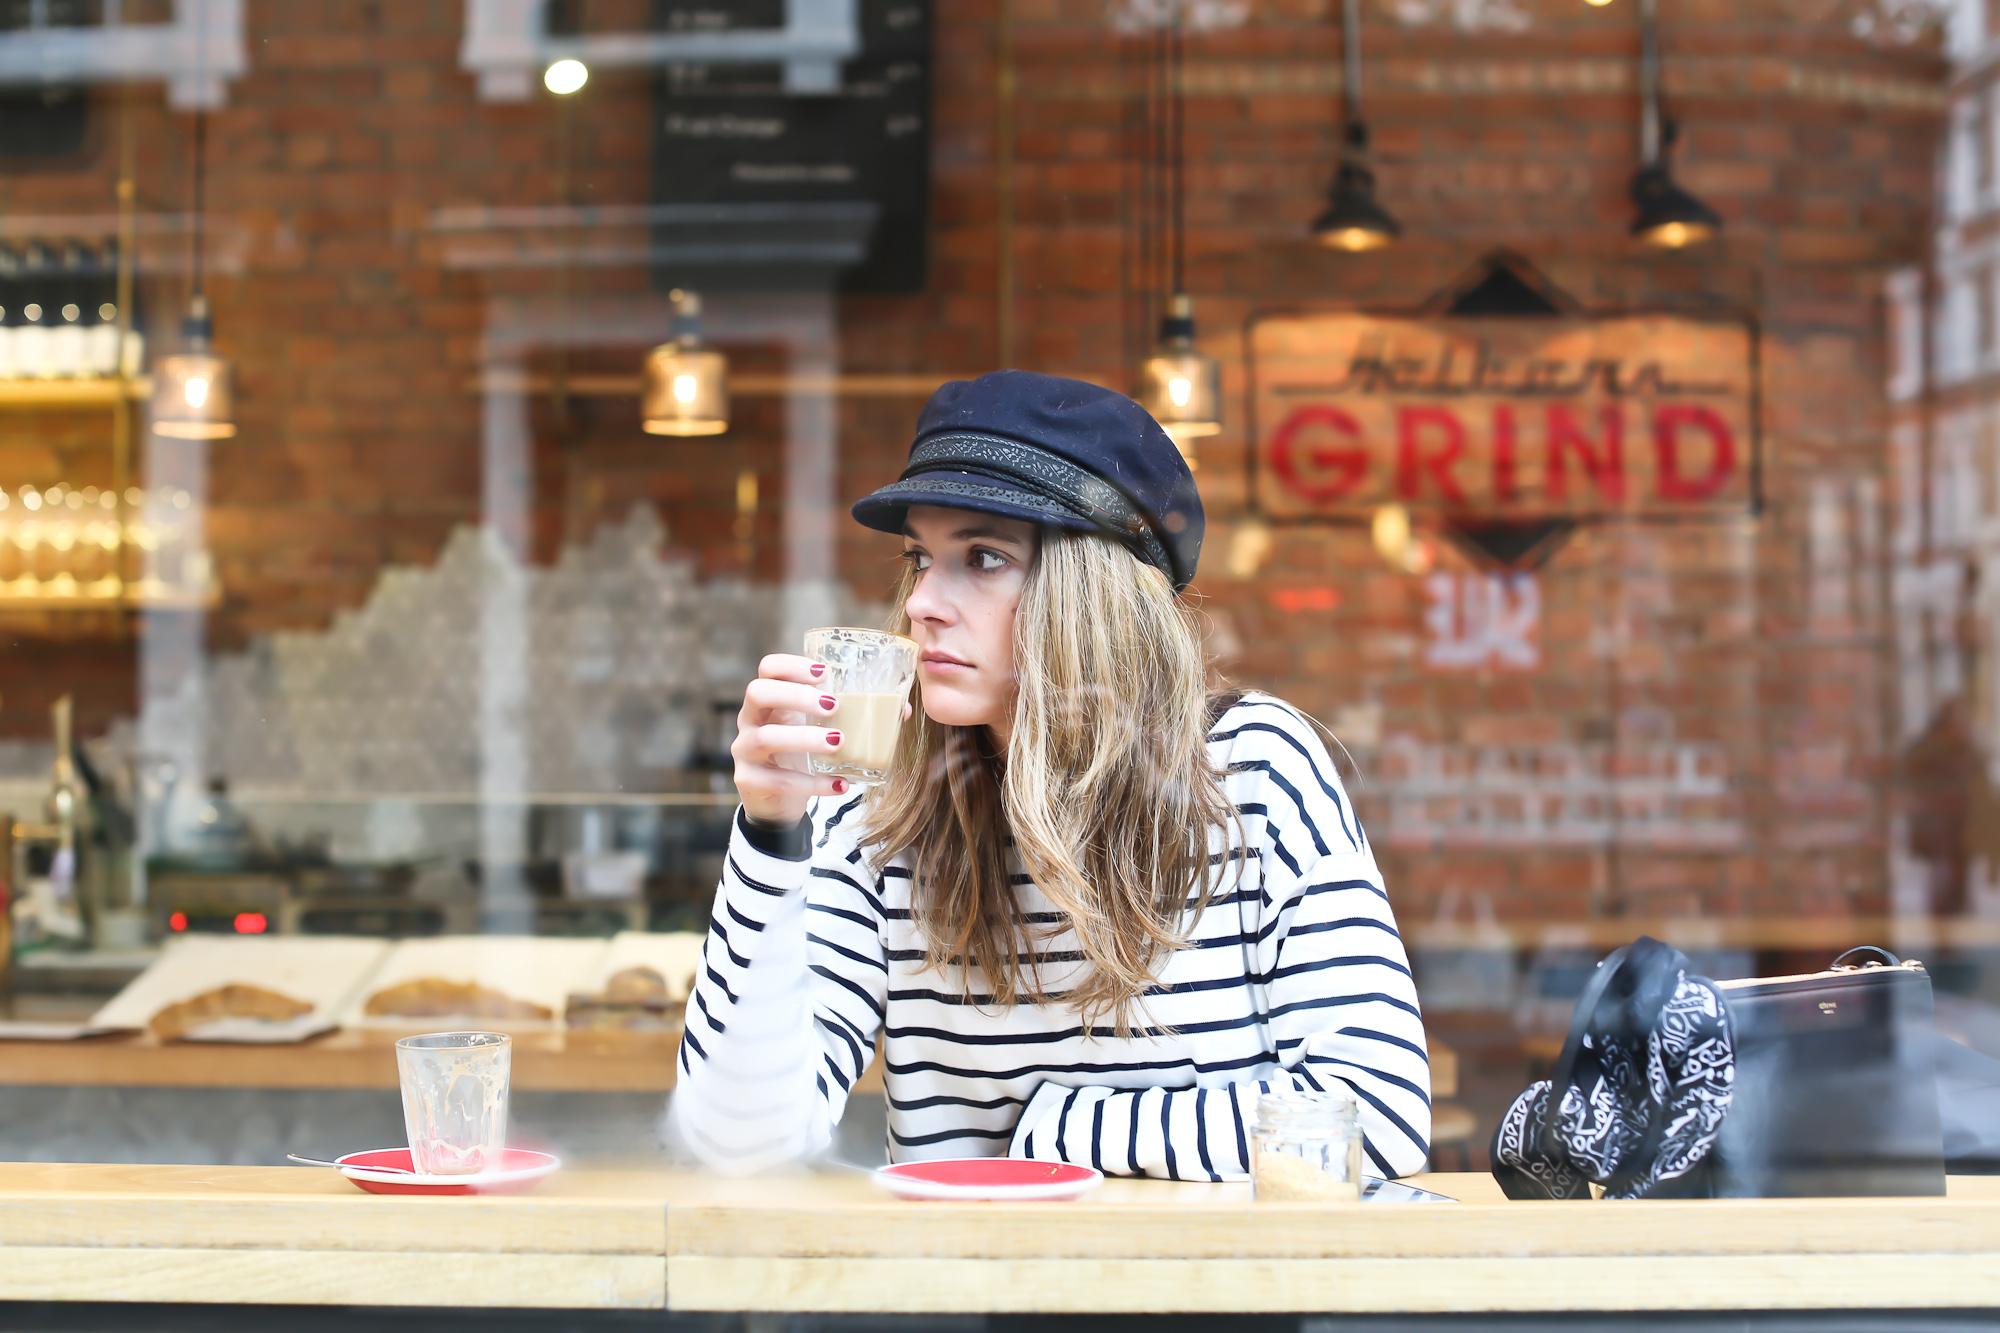 Clochet_streetstyle_london_cos_long_woo_coat_saint_james_mariniere_cup_celine_trio_bag